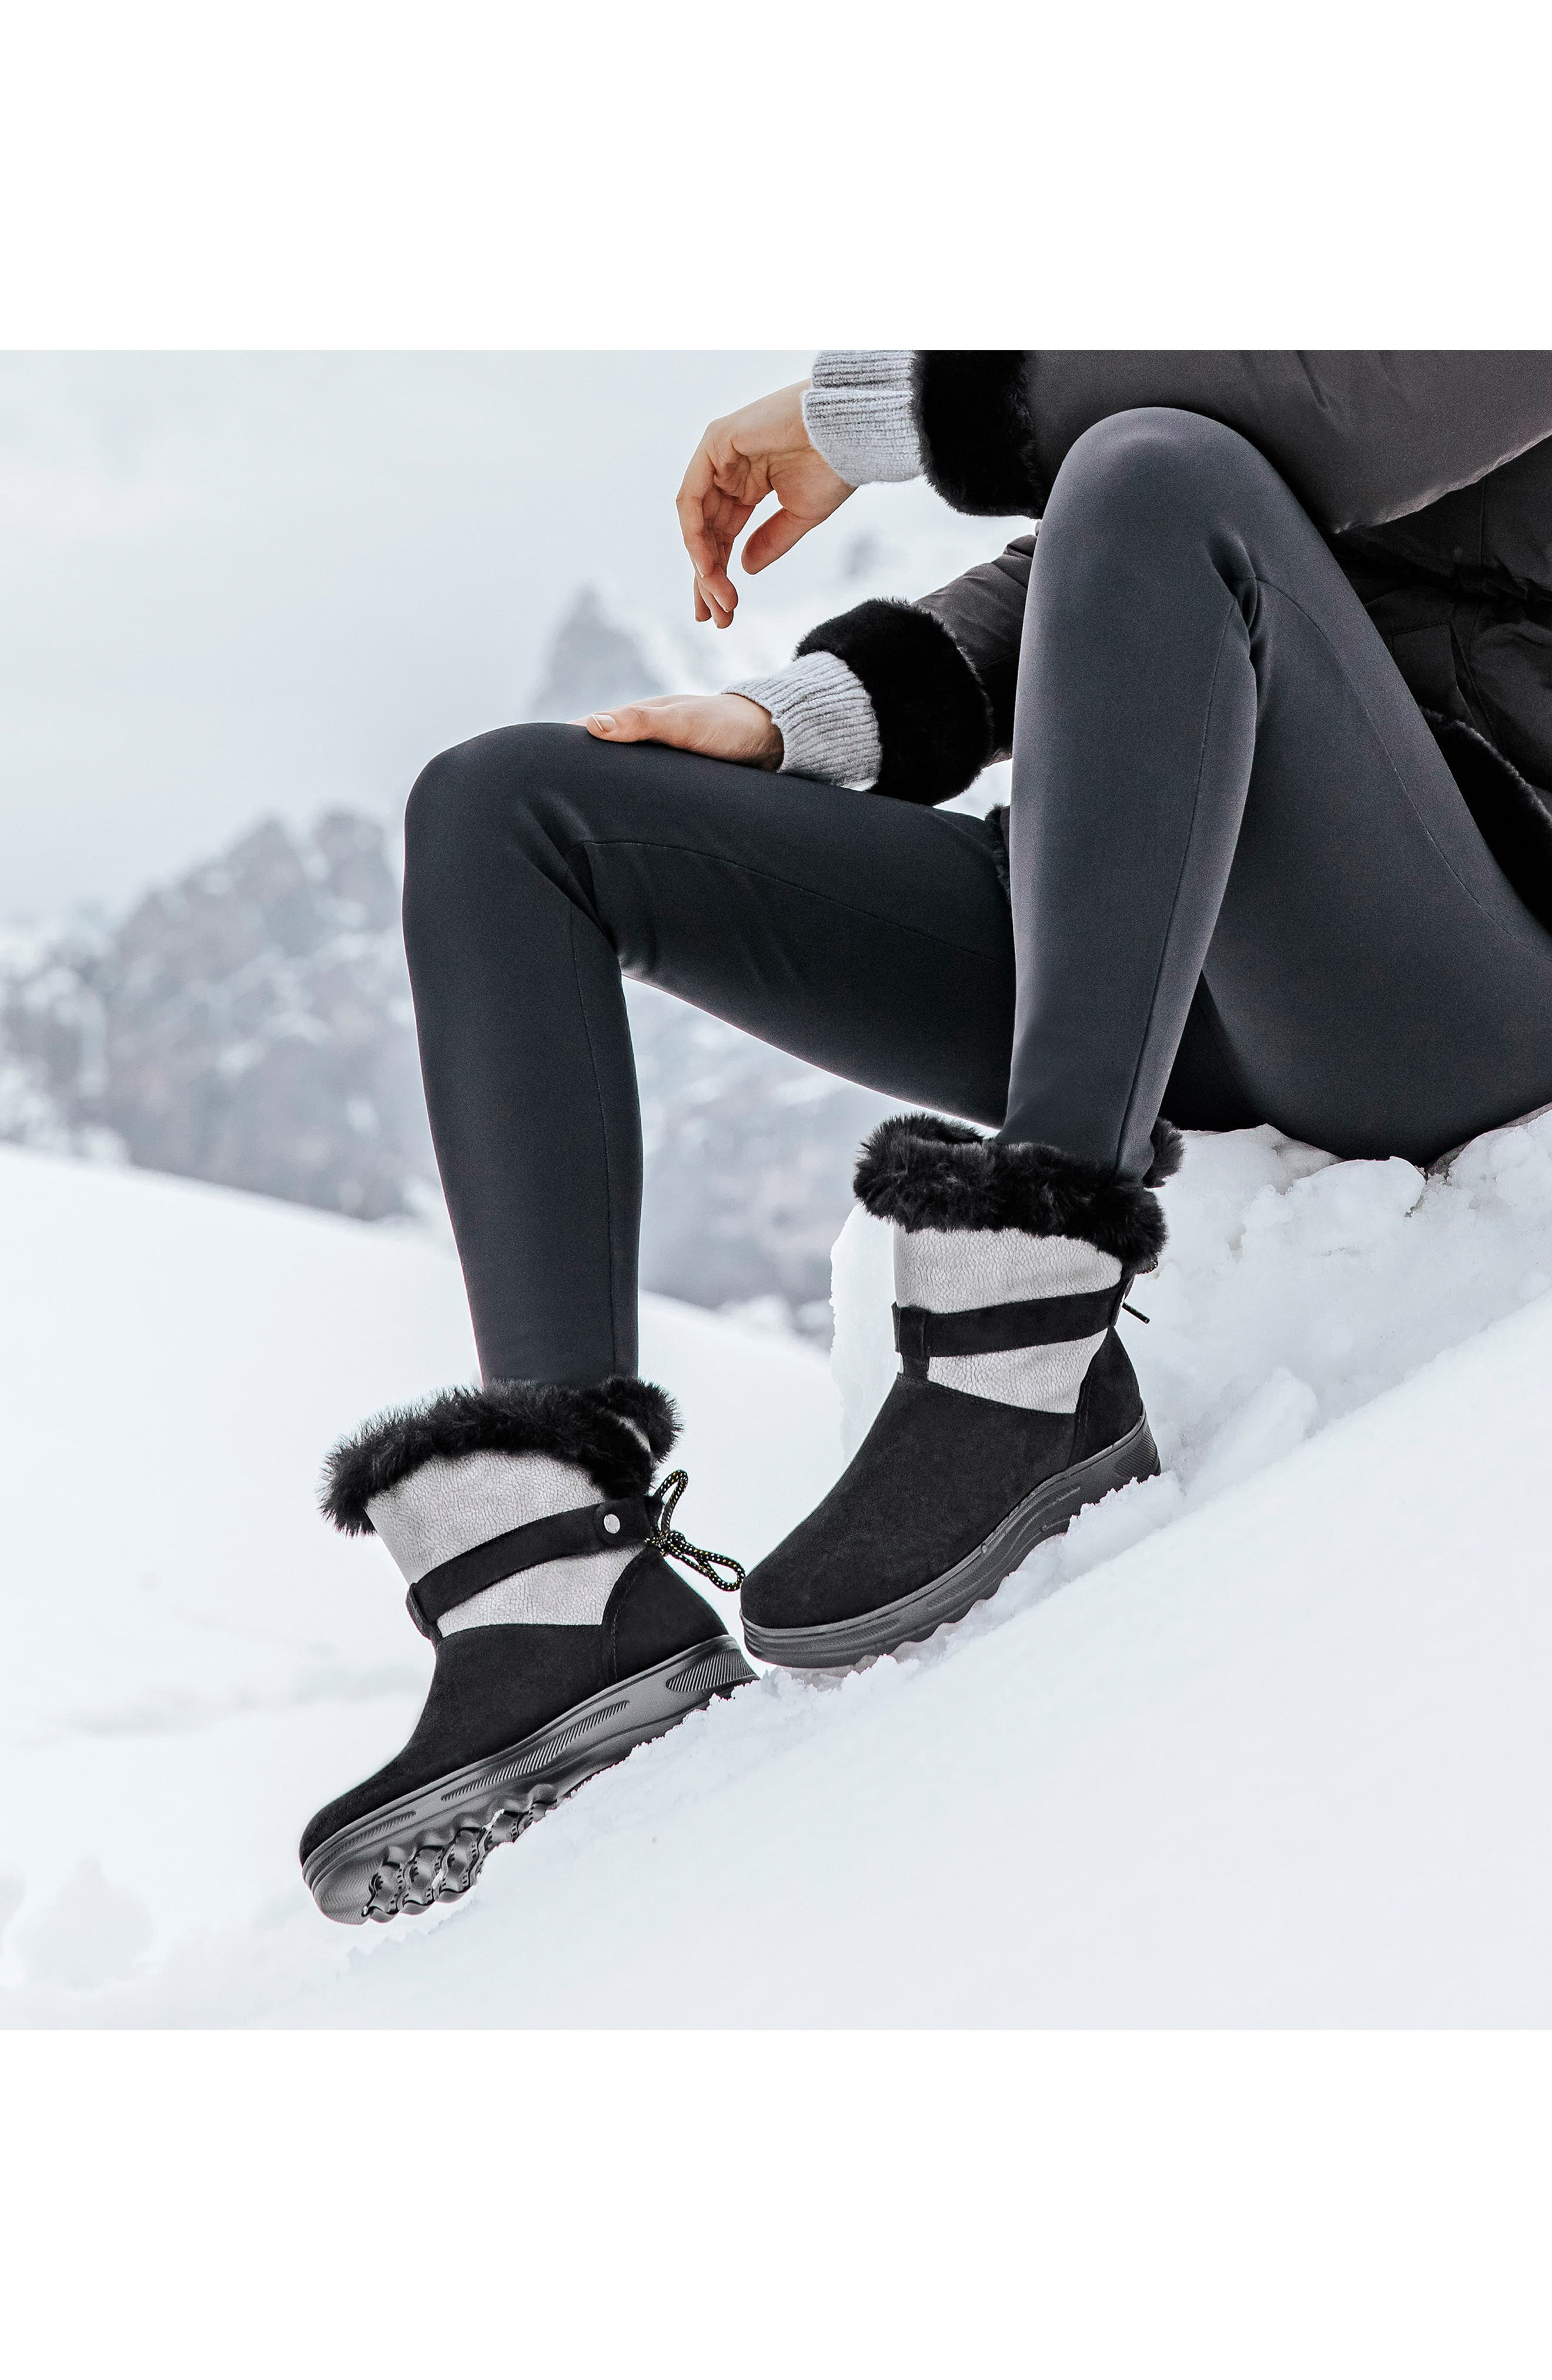 Hosmos ABX Waterproof Faux Fur Trim Boot,                             Alternate thumbnail 6, color,                             BLACK/ DARK GREY SUEDE